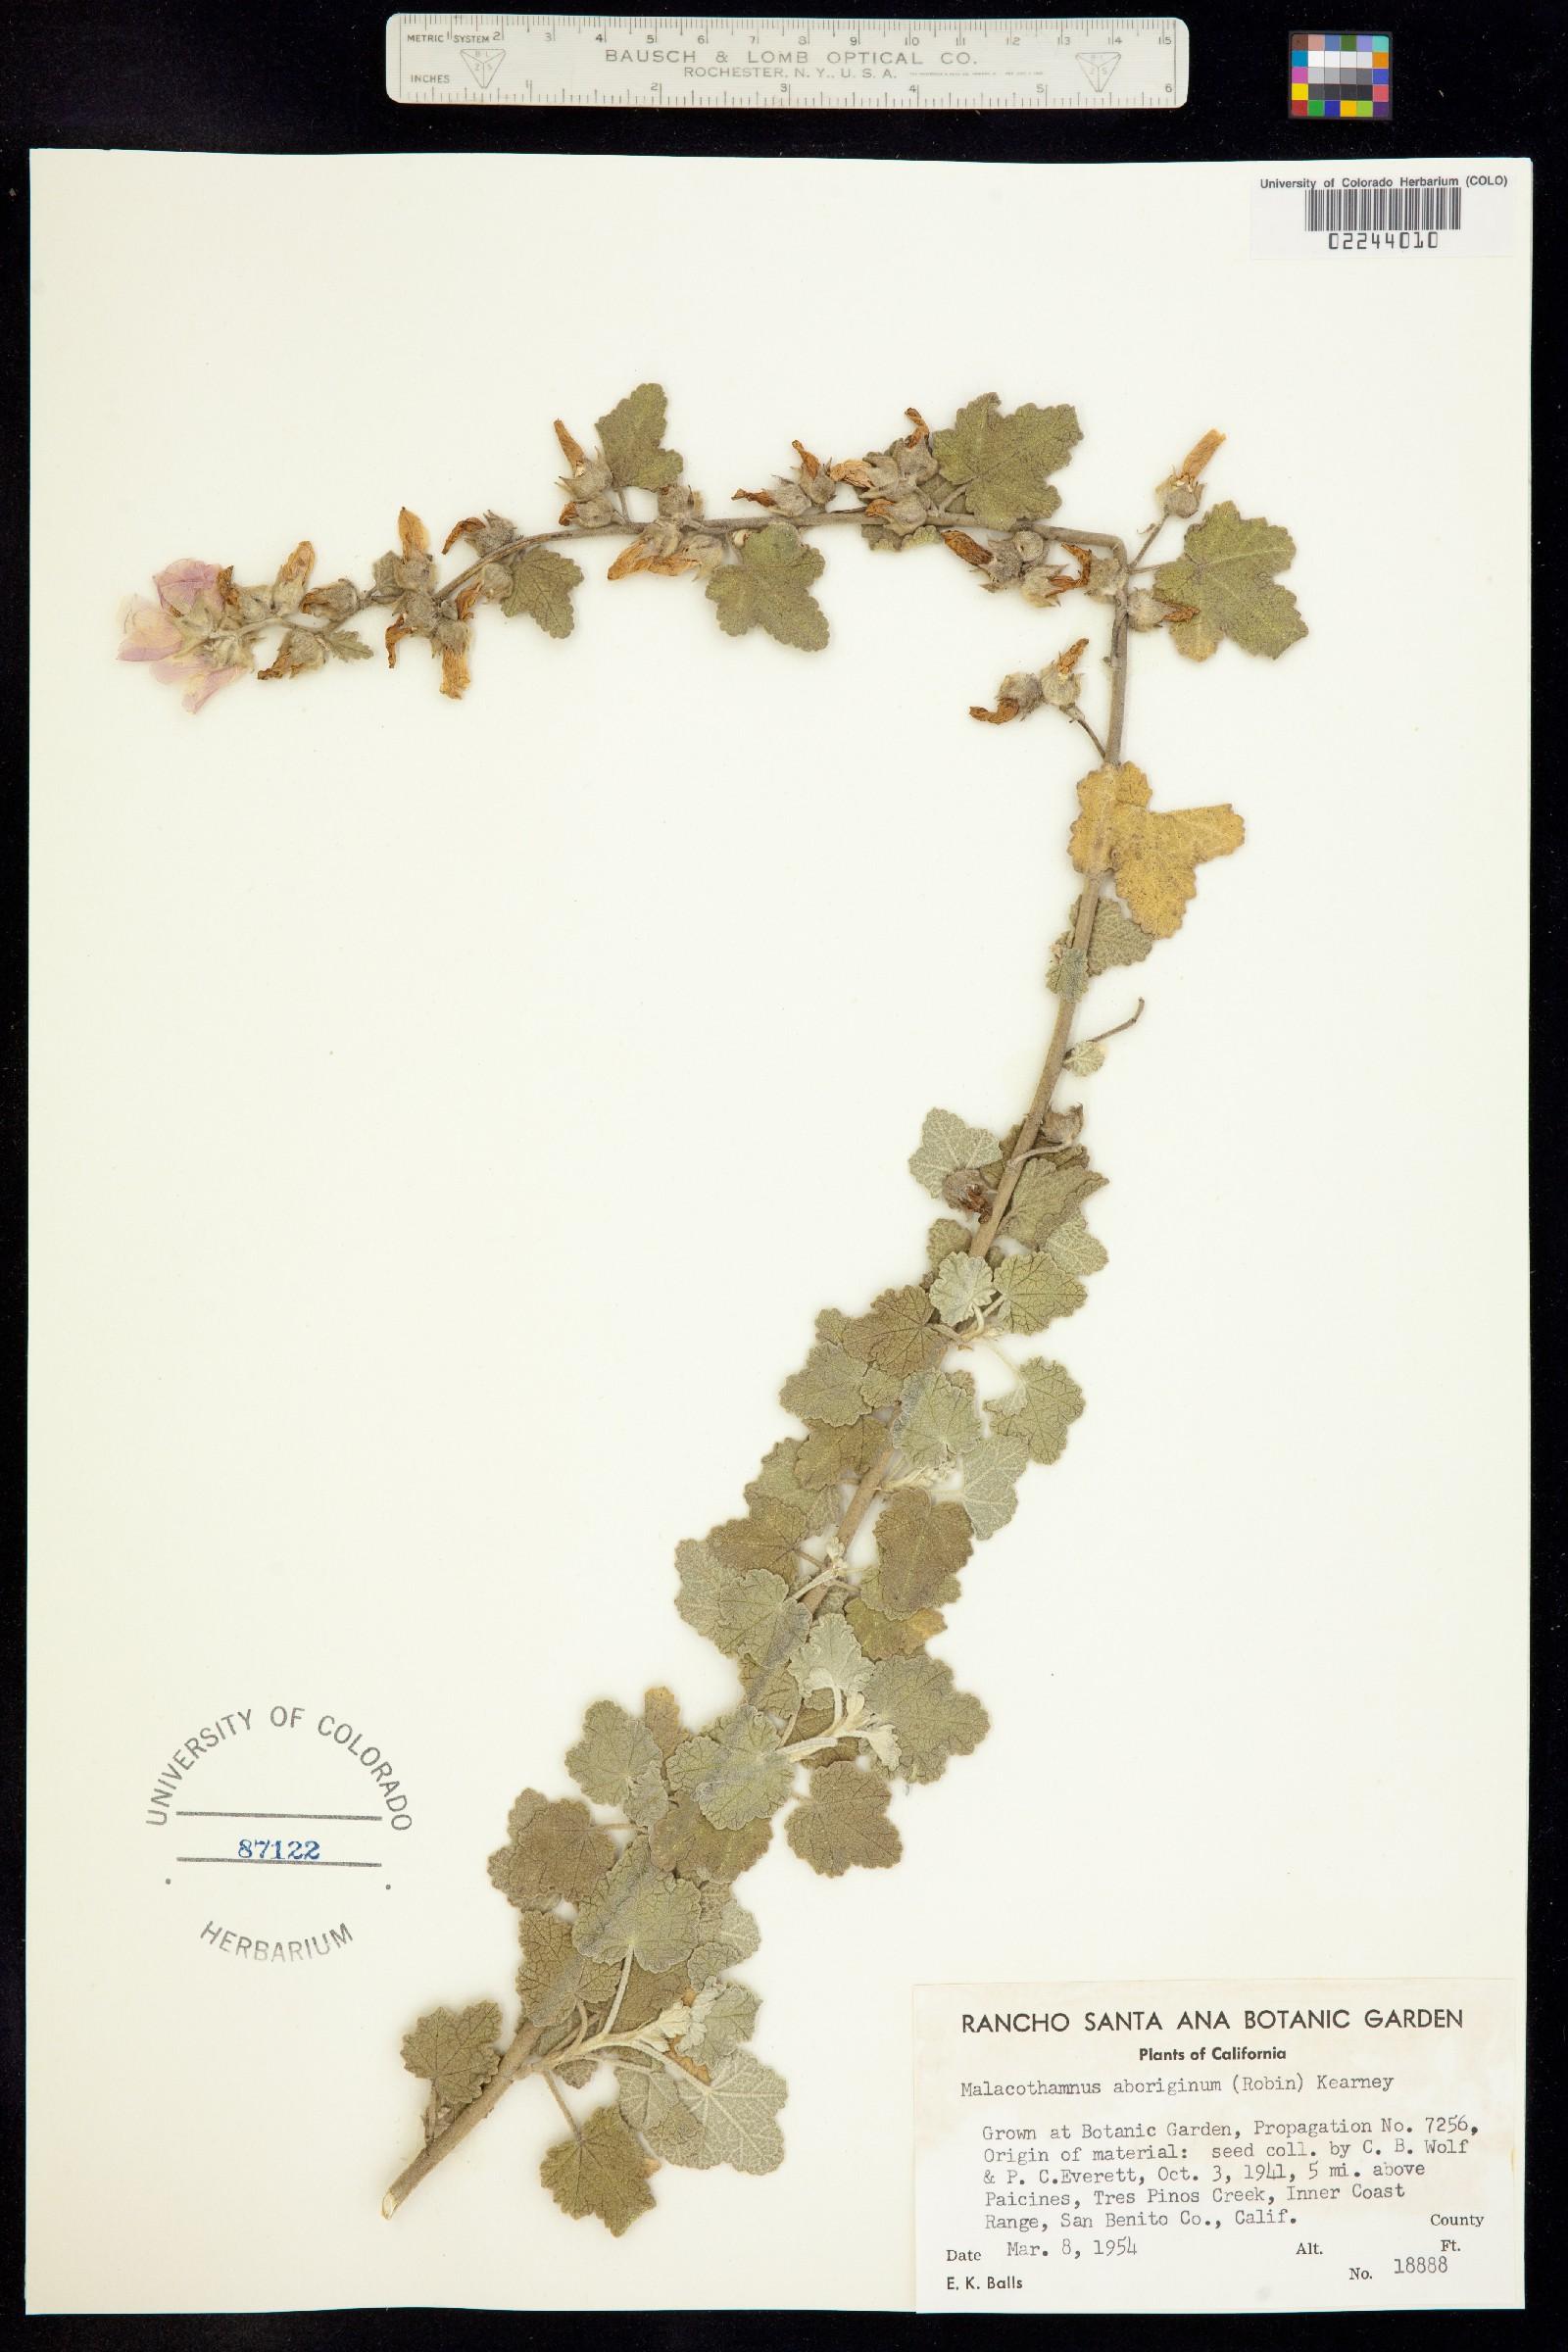 Malacothamnus image